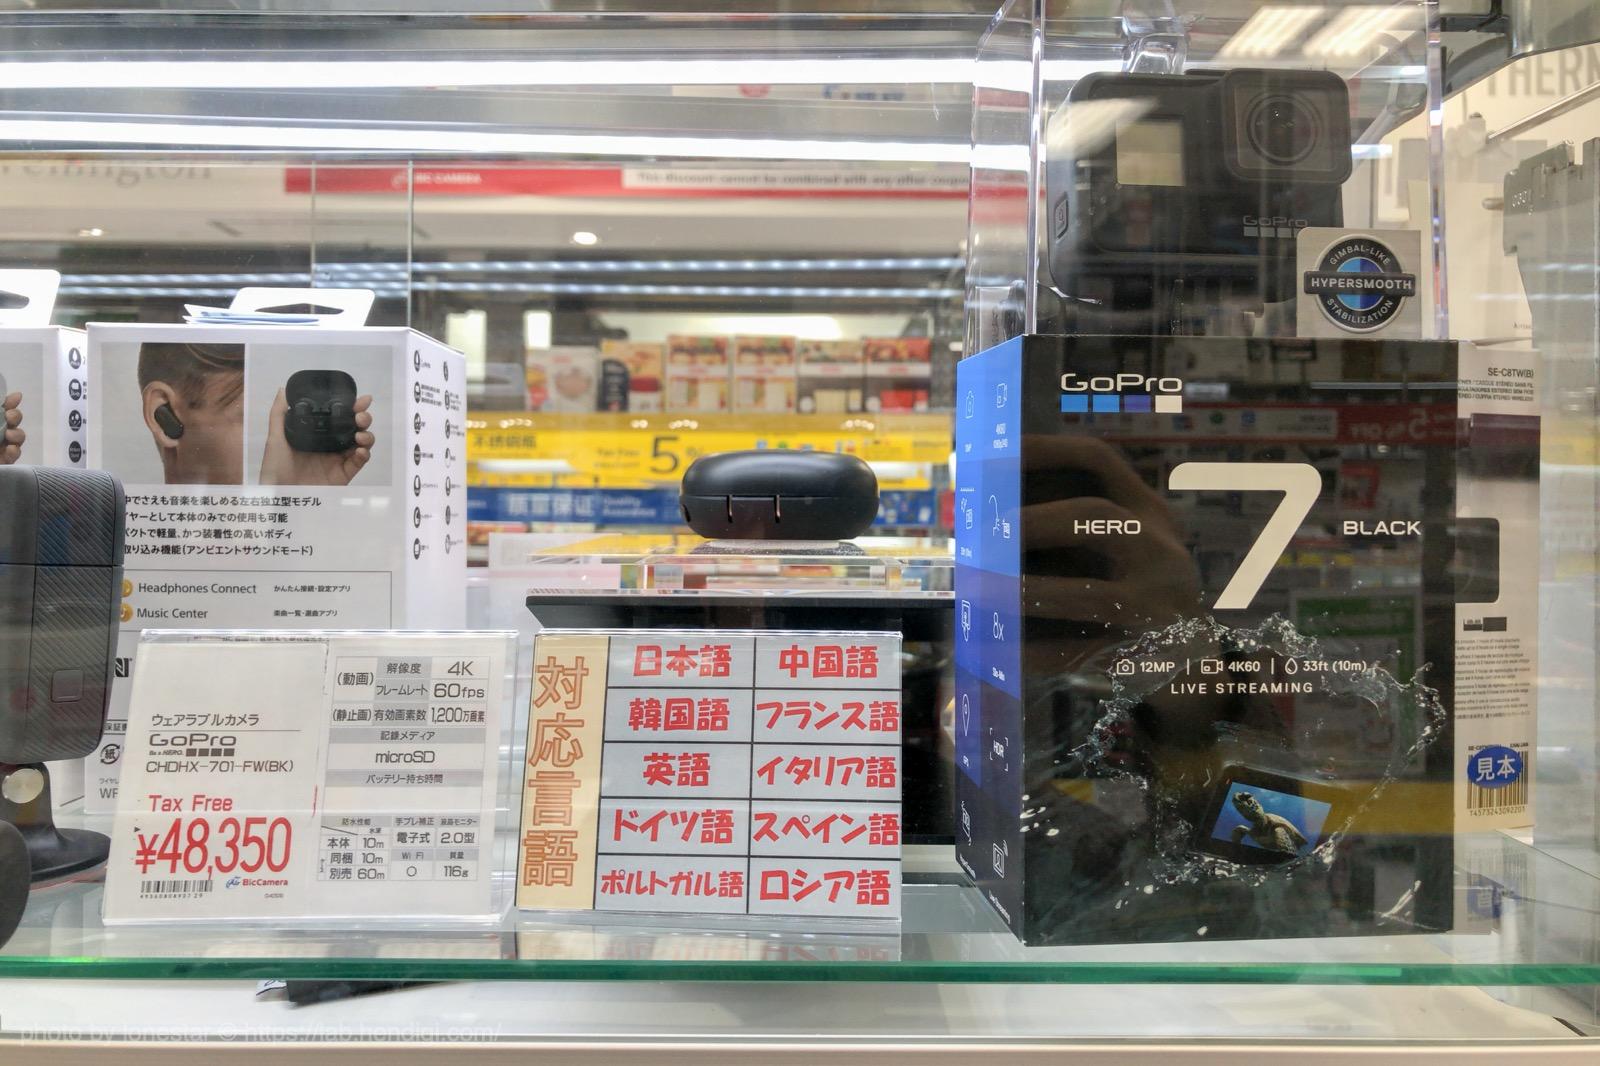 GoPro HERO7 Black 免税店